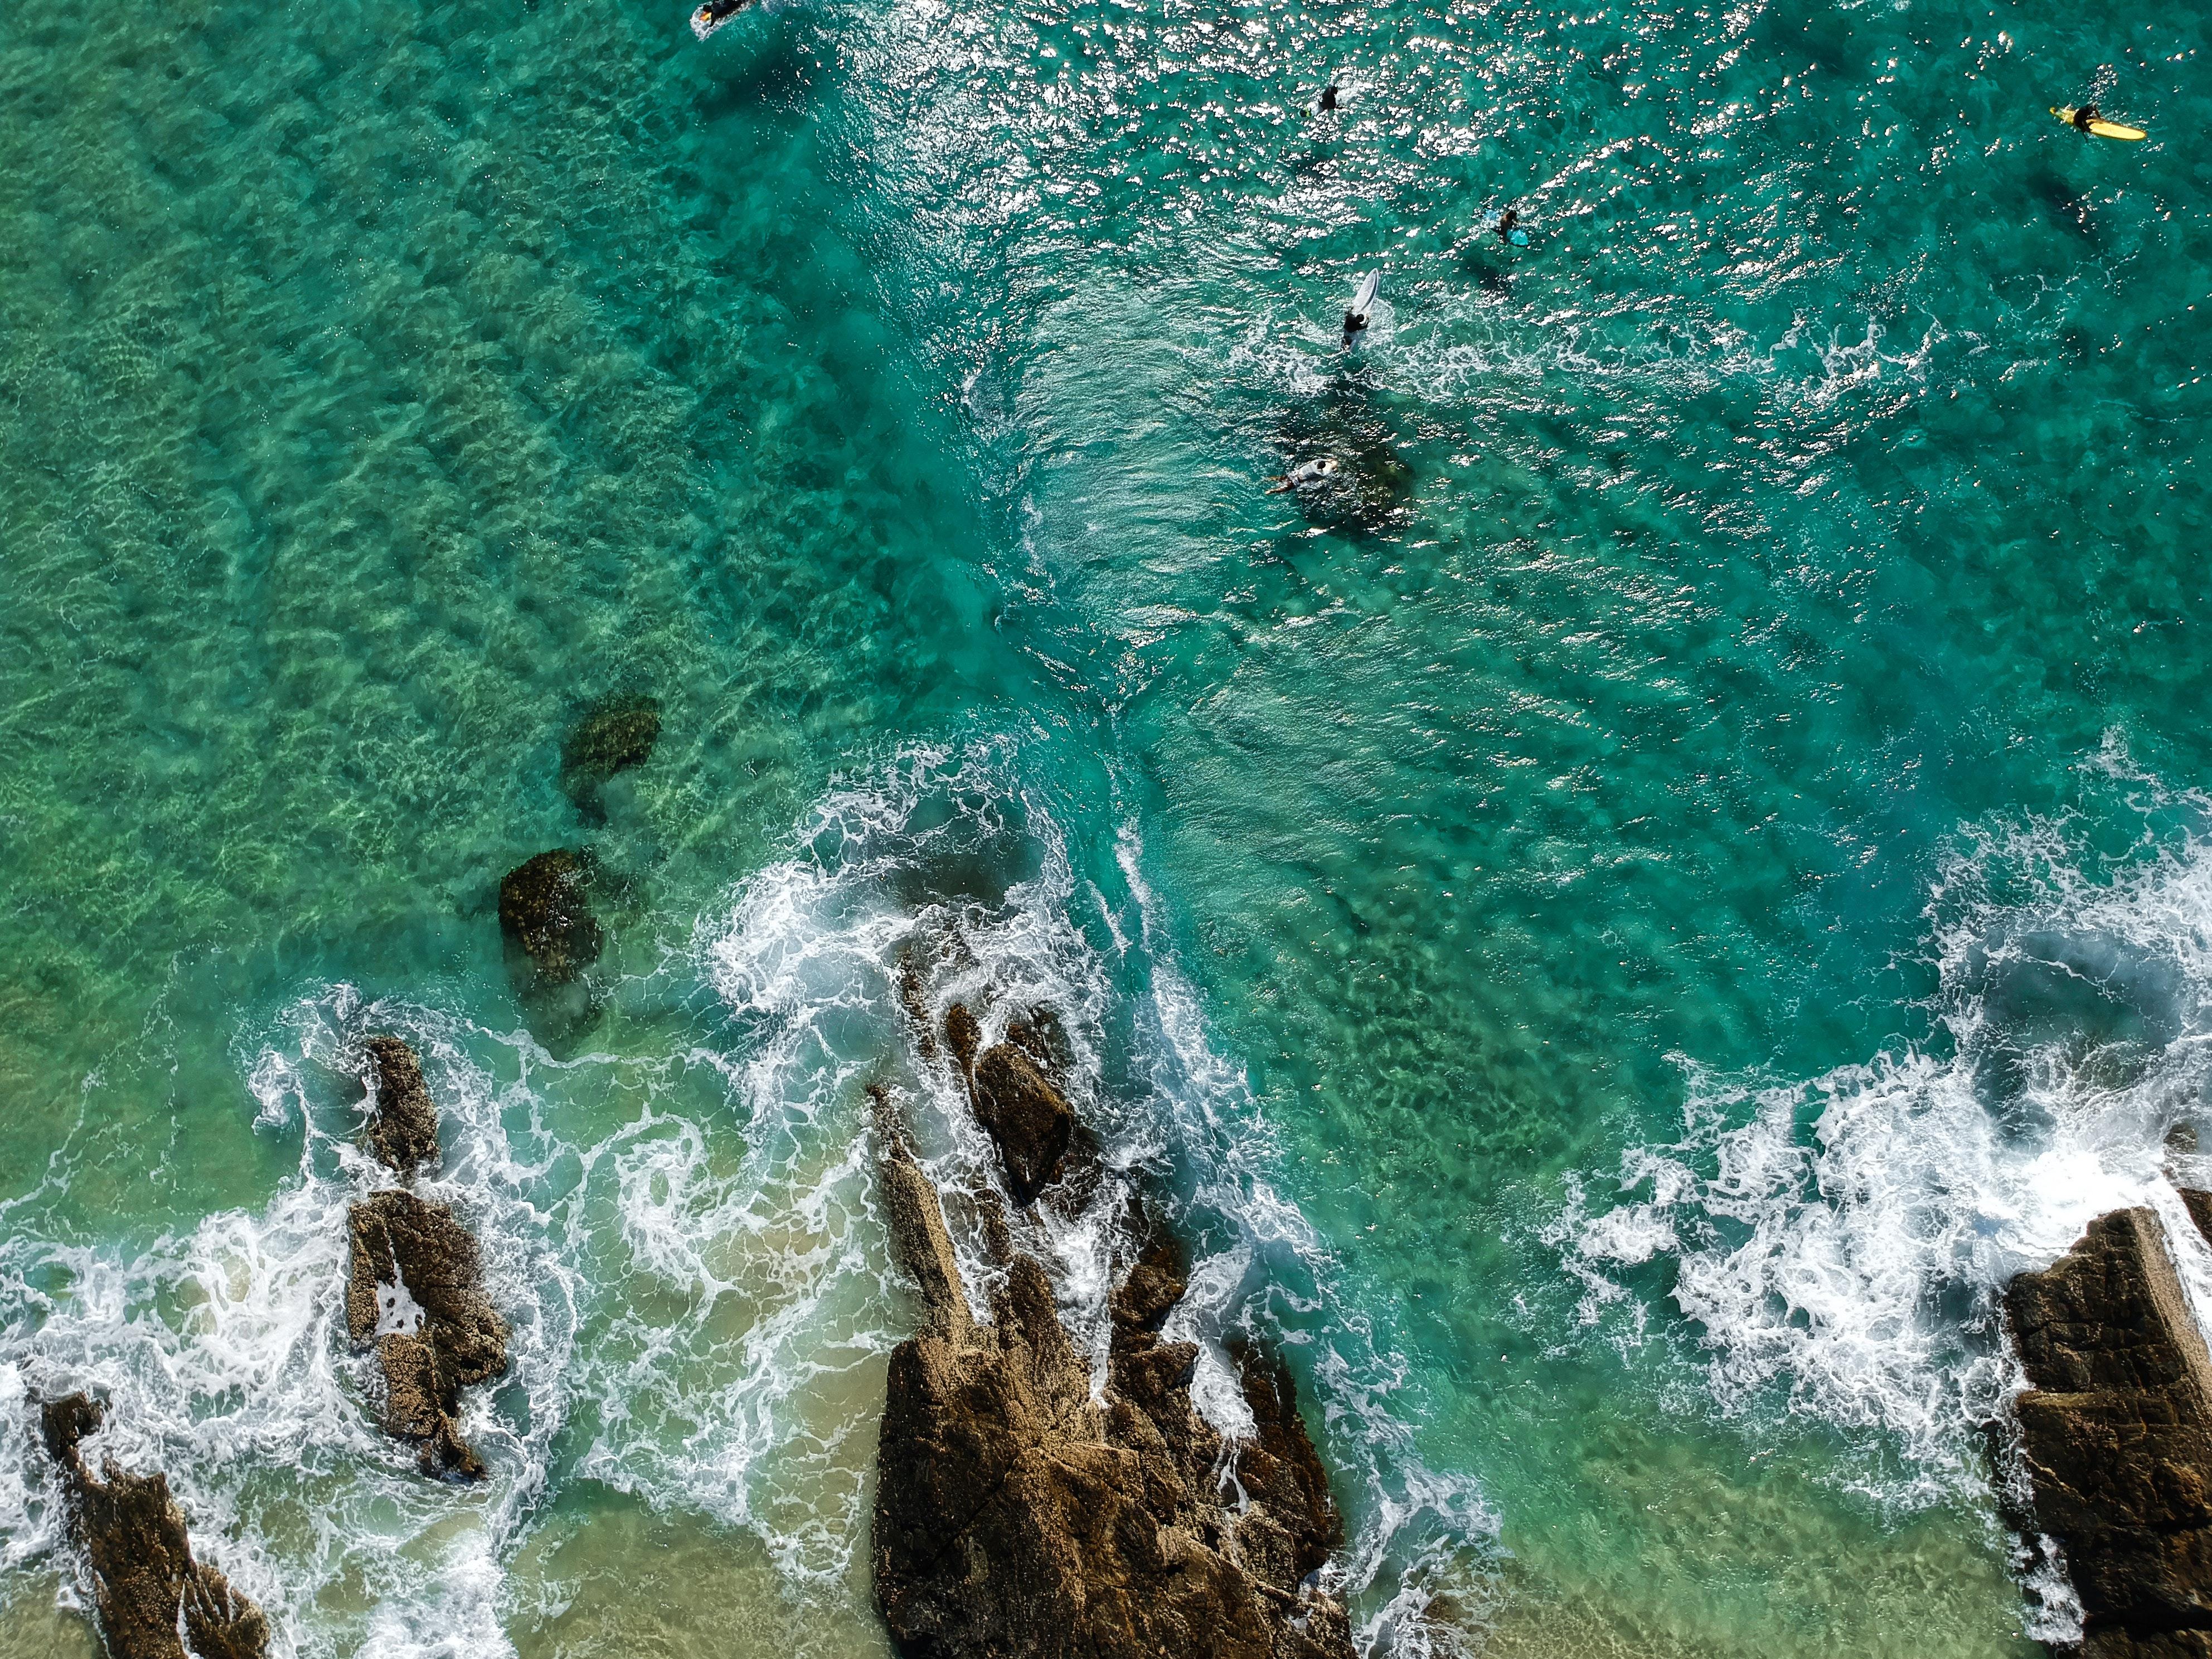 aerial-shot-australia-bird-s-eye-view-1310035